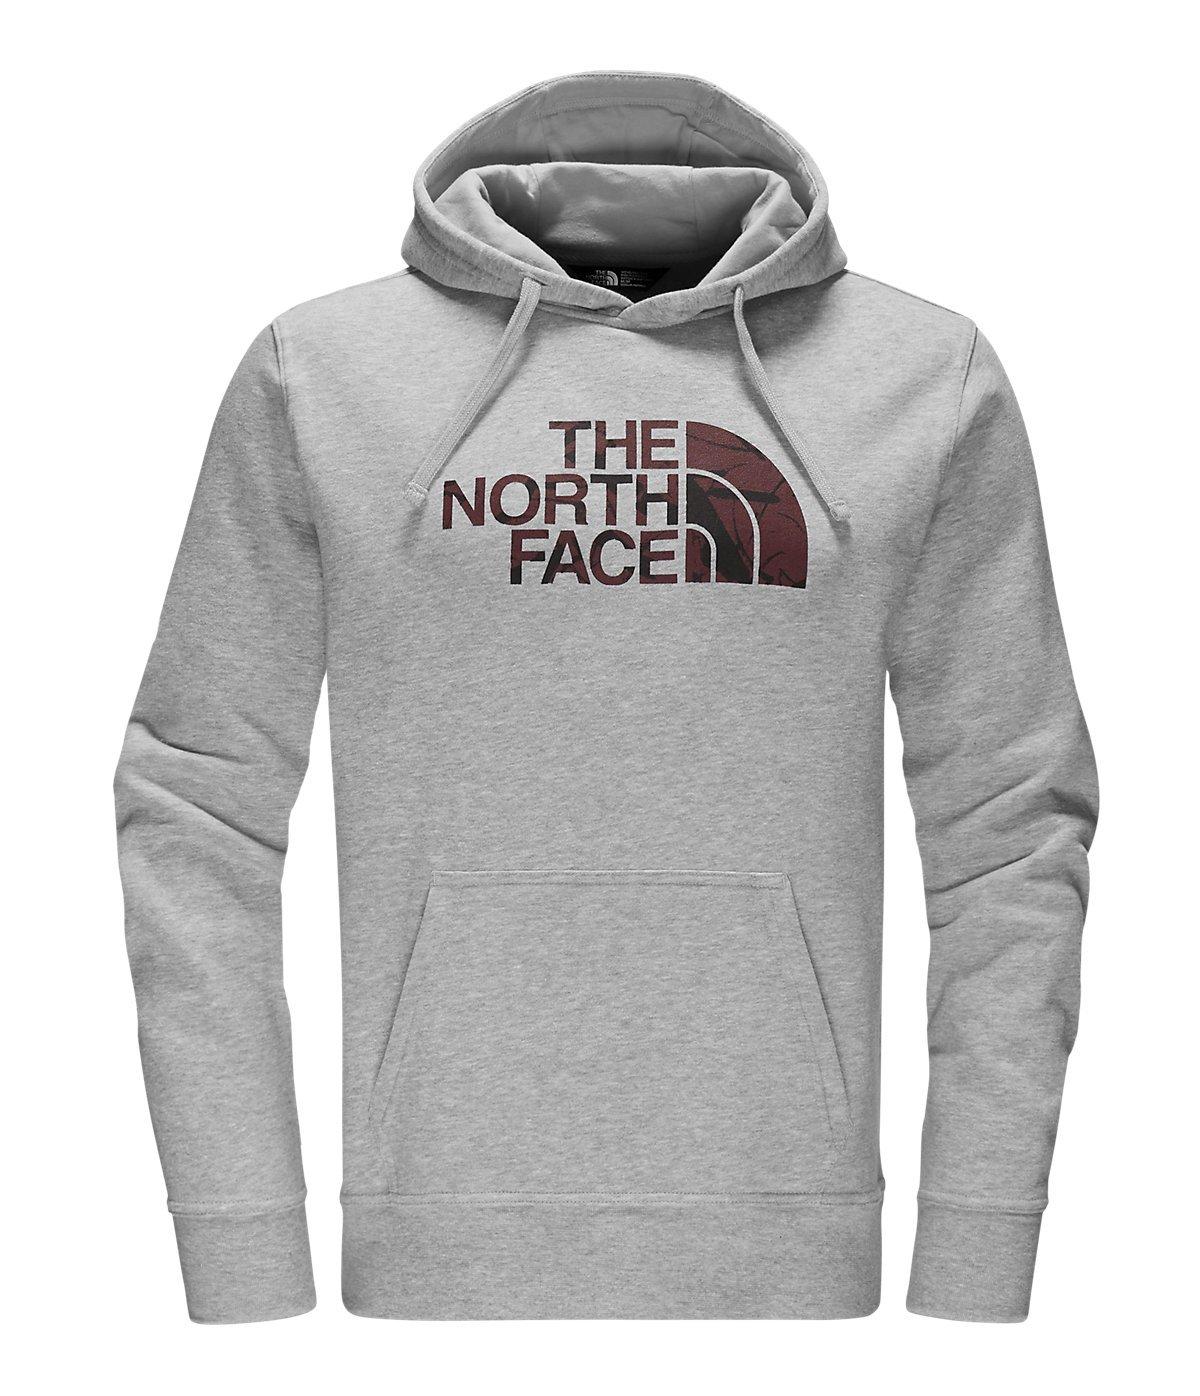 bd888b14e Galleon - The North Face Men's Half Dome Homestead Pullover Hoodie ...